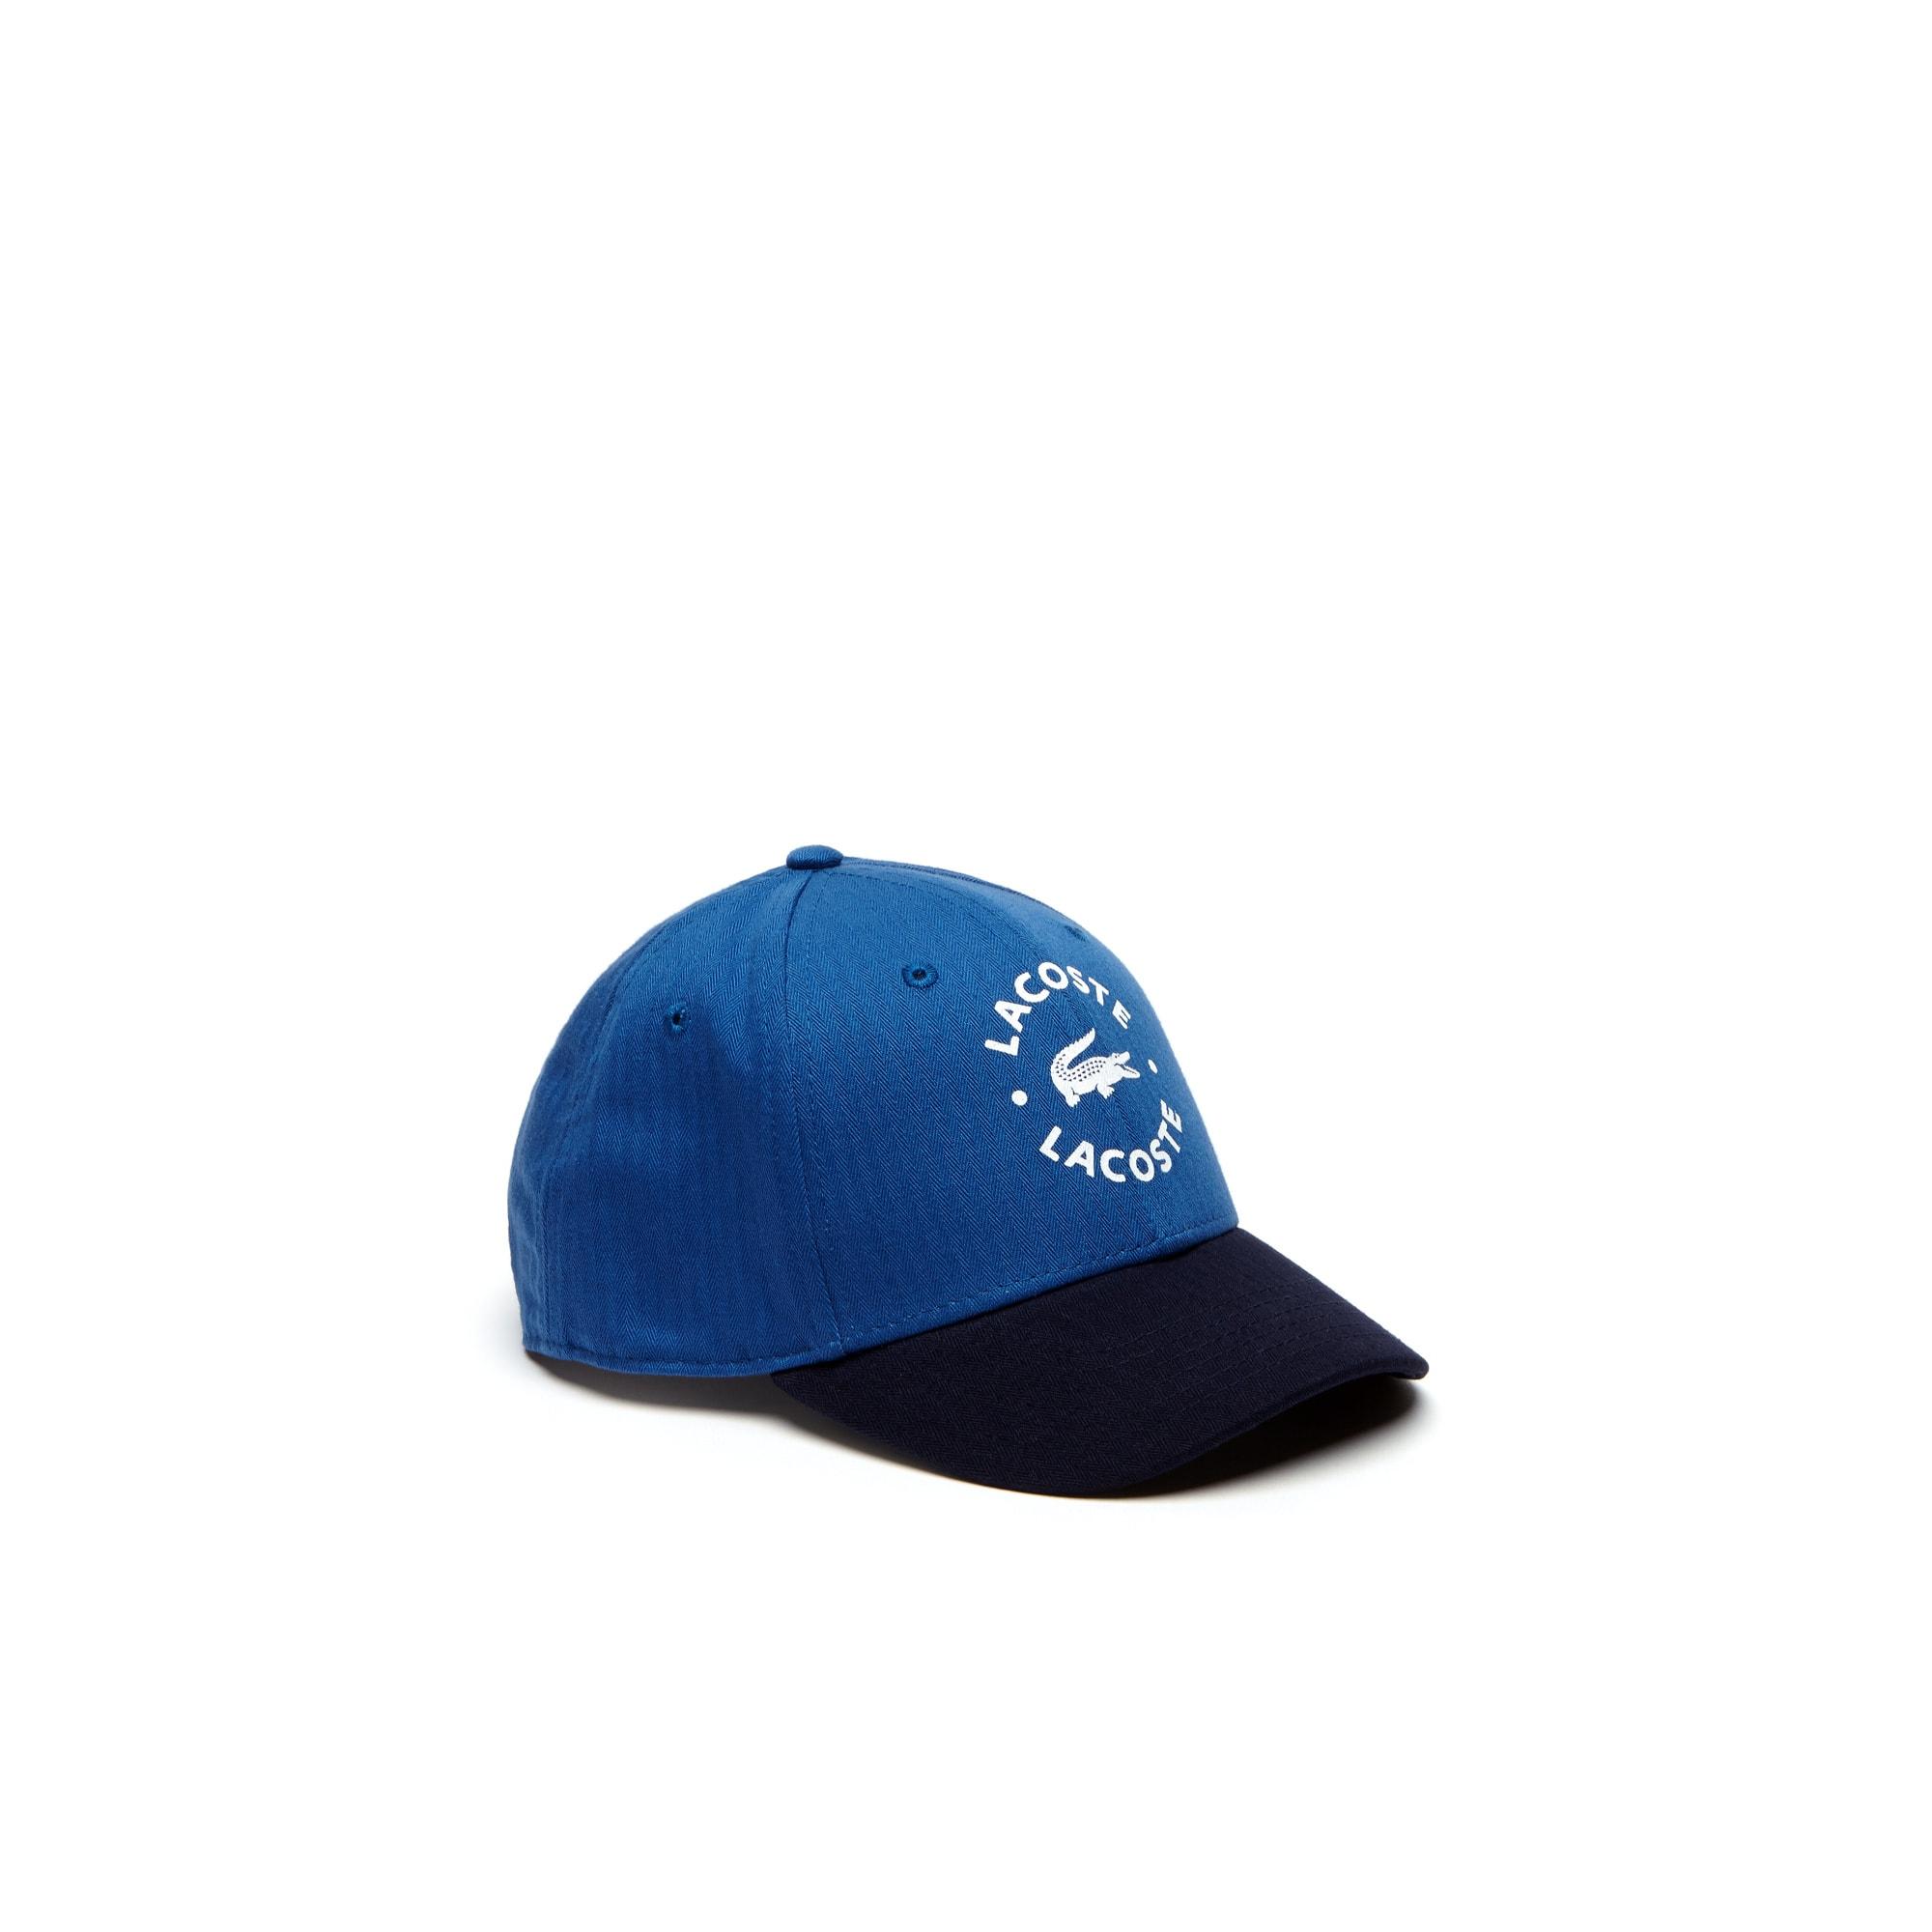 Gorra bicolor de niño de gabardina con marcado Lacoste